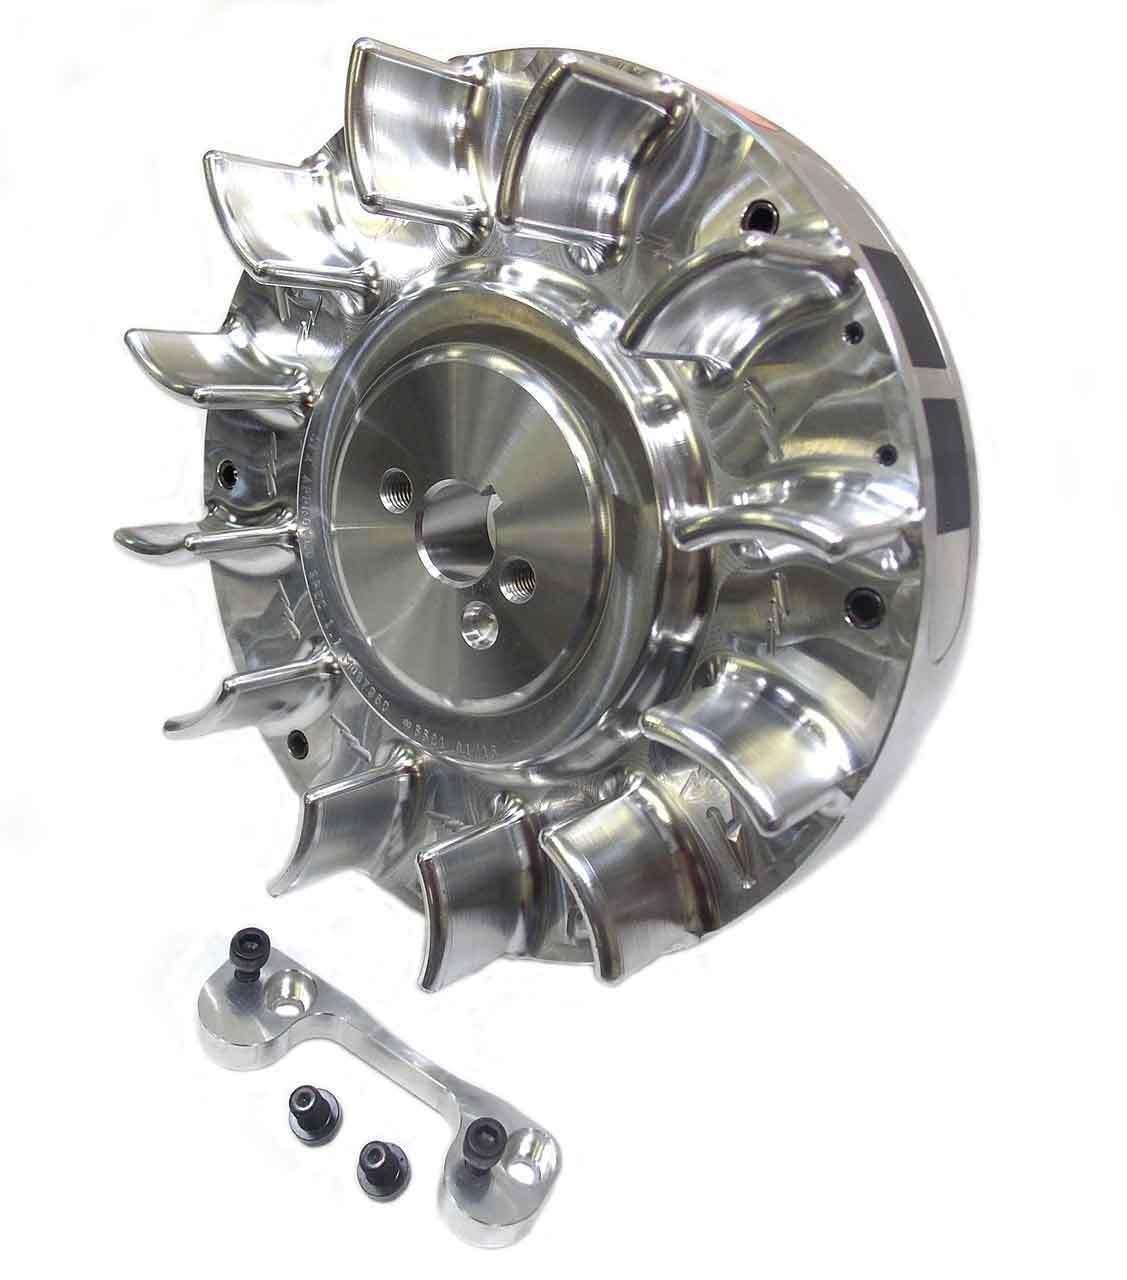 ARC PVL Billet Flywheel, Non Adj, Predator 212 Non-Hemi